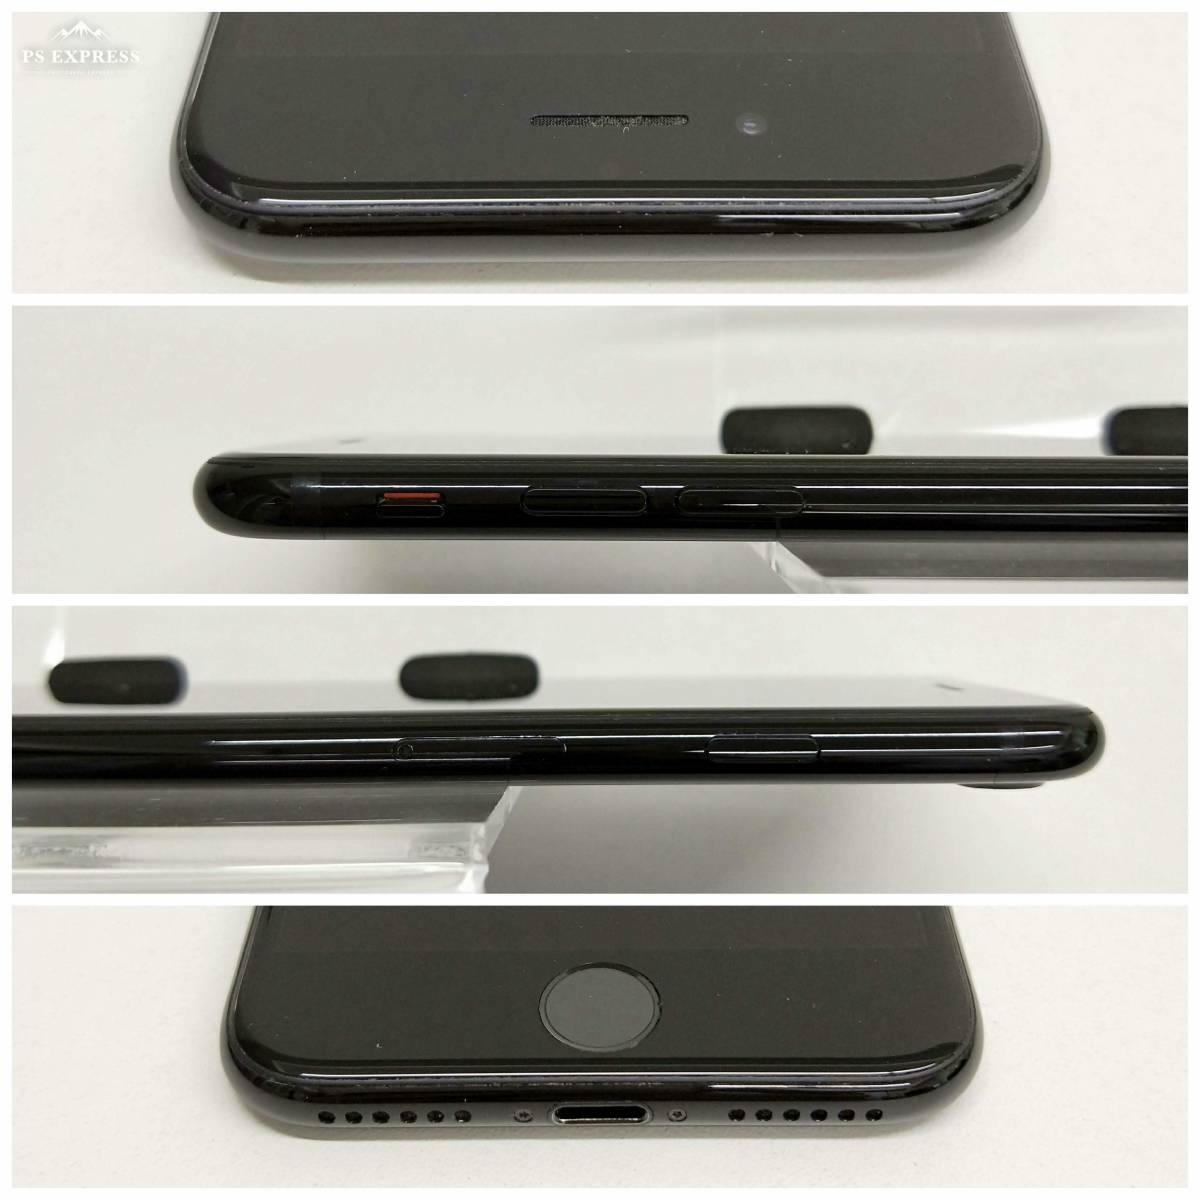 SIMフリー iPhone 7 128GB Jet Black 美品 バッテリー85% <本体のみ> #051_画像8